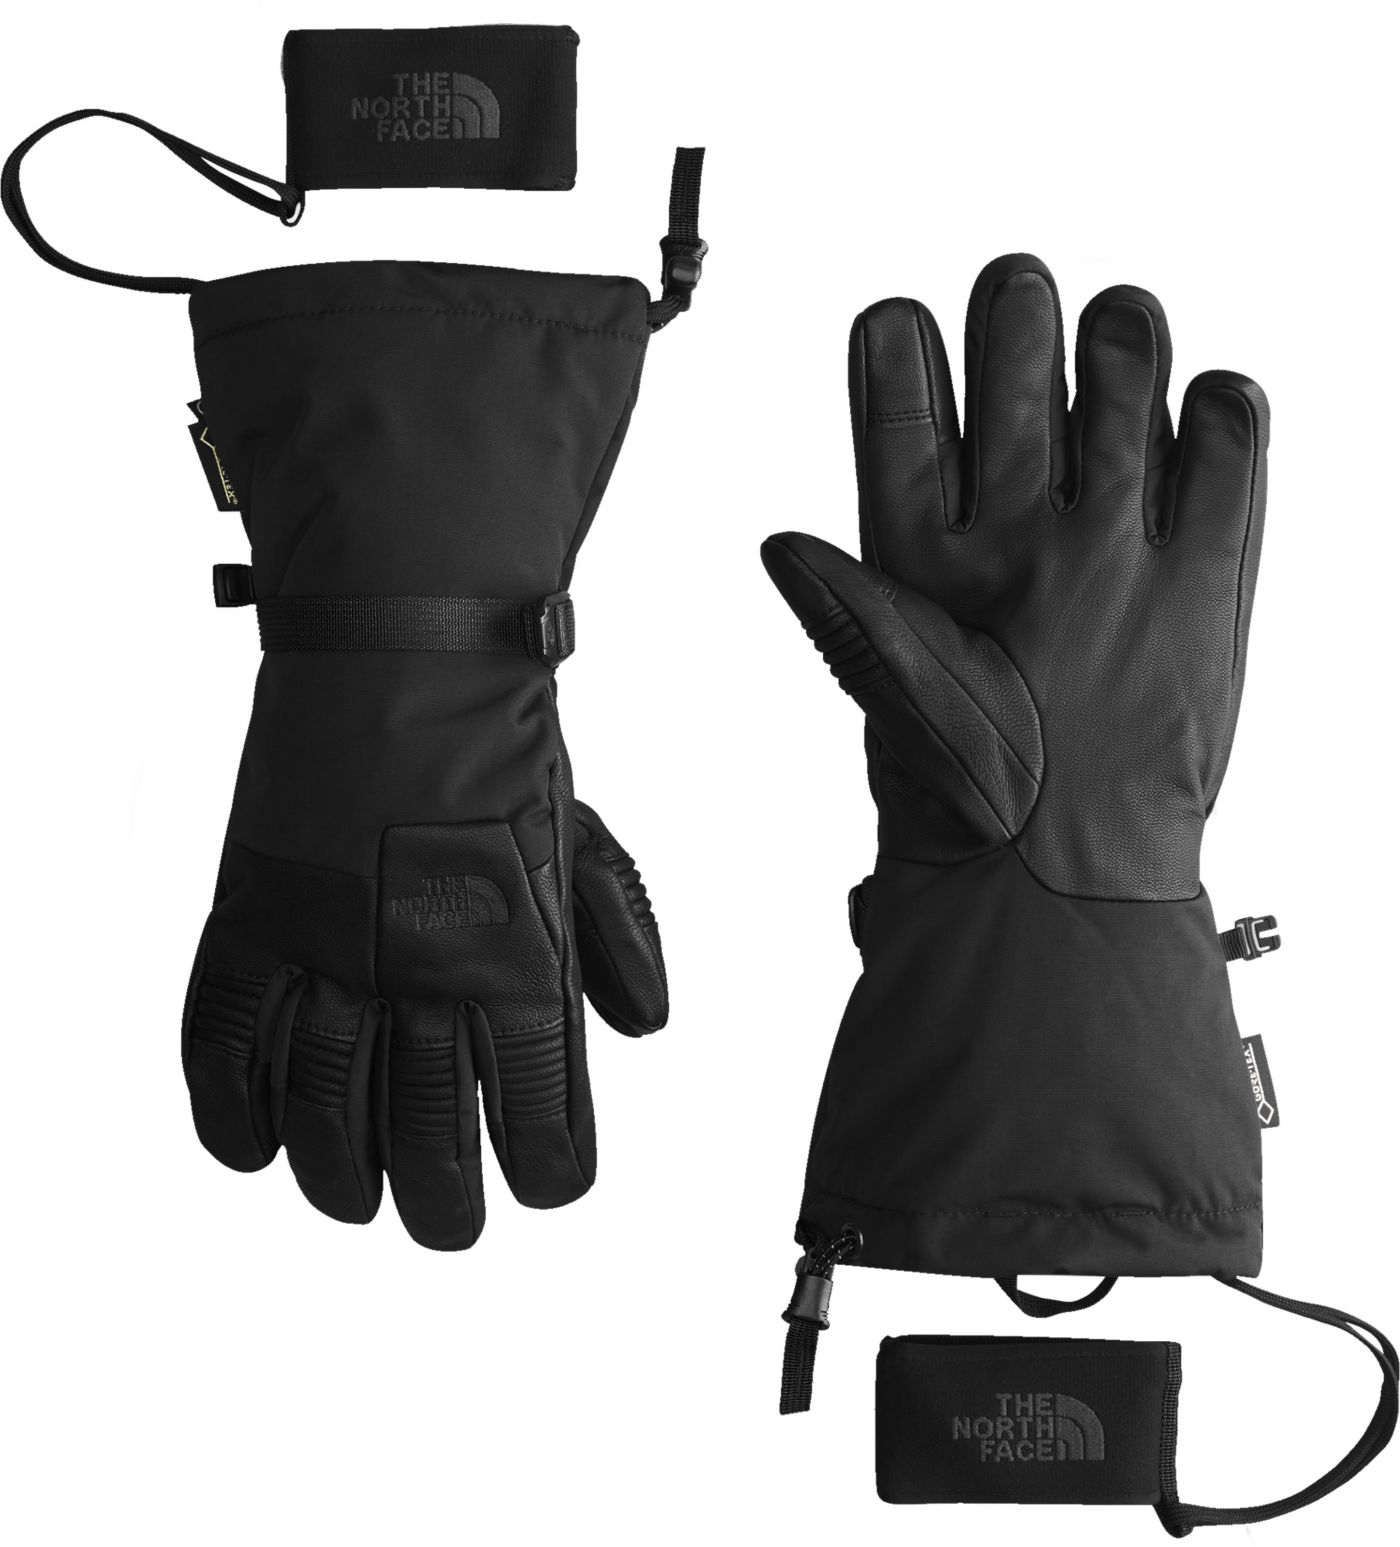 The North Face Men's Powdercloud GORE-TEX Gloves